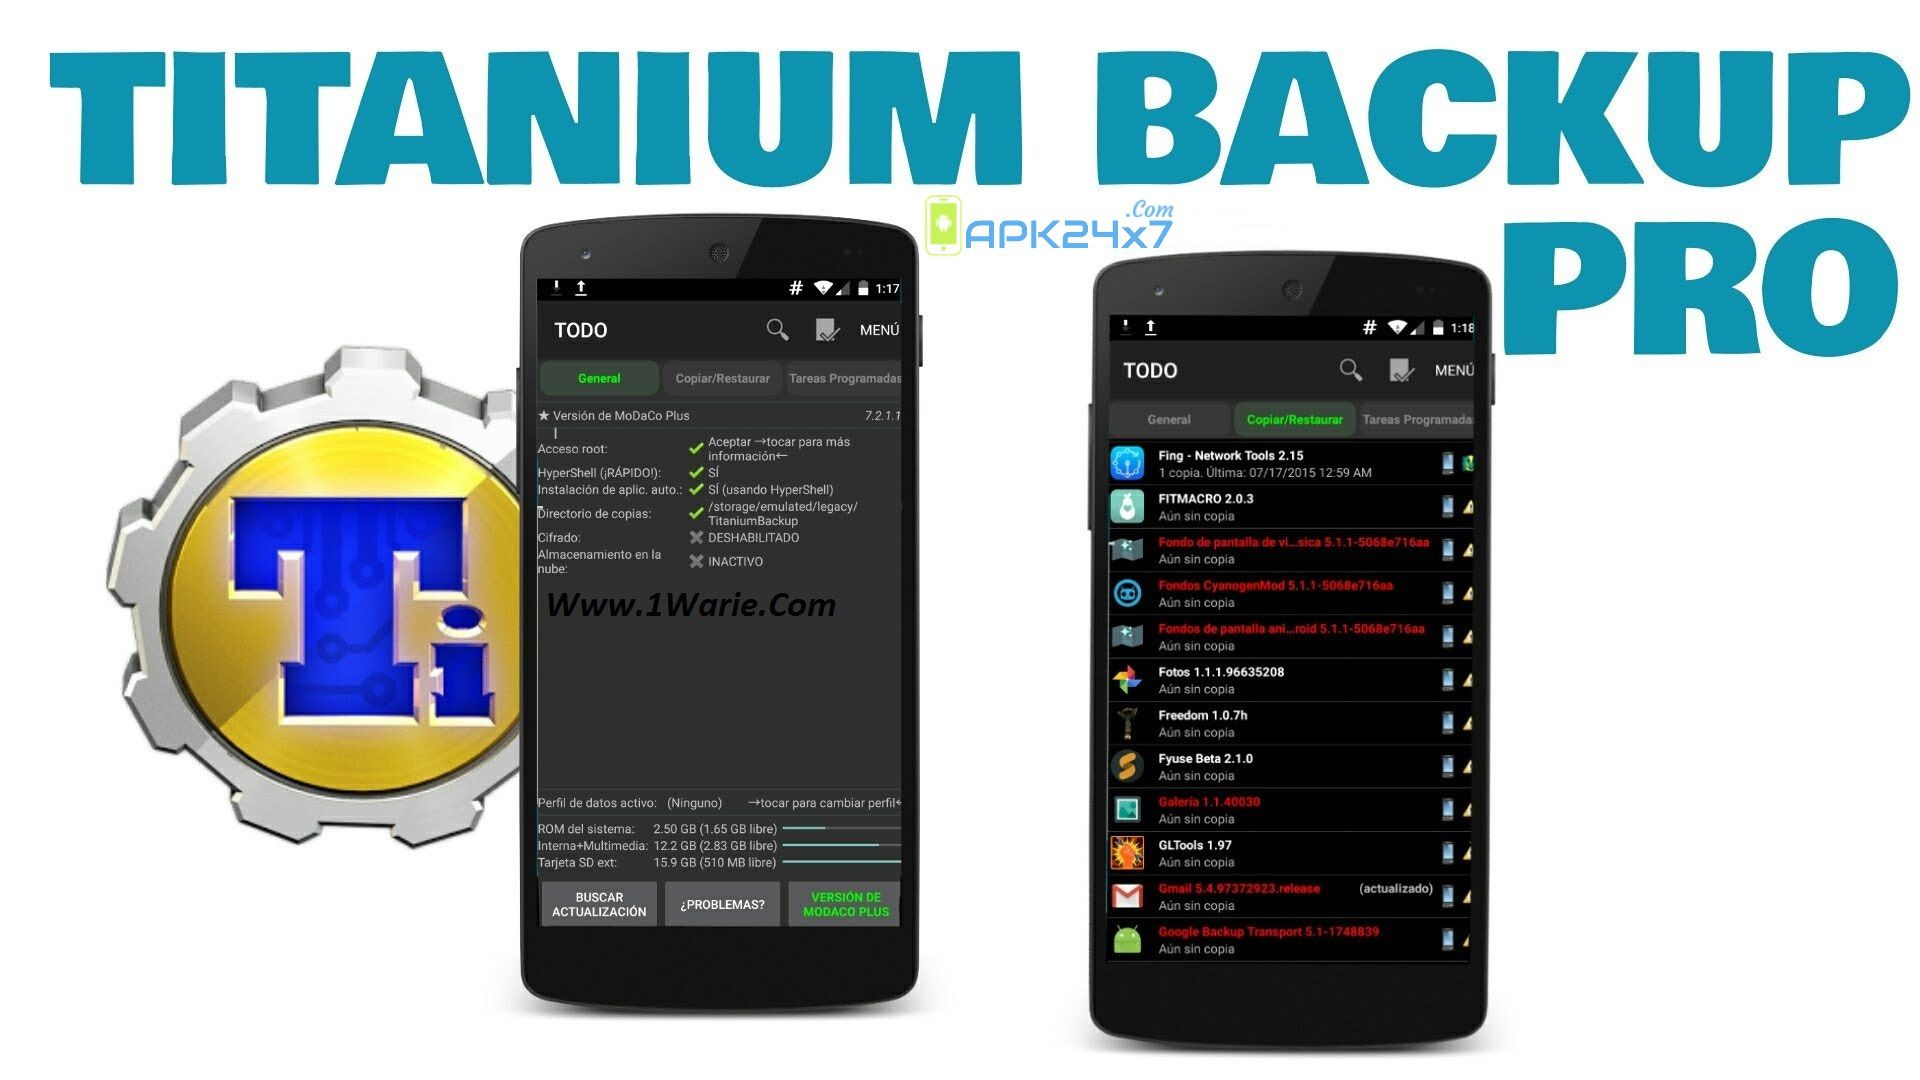 Titanium backup pro apk full